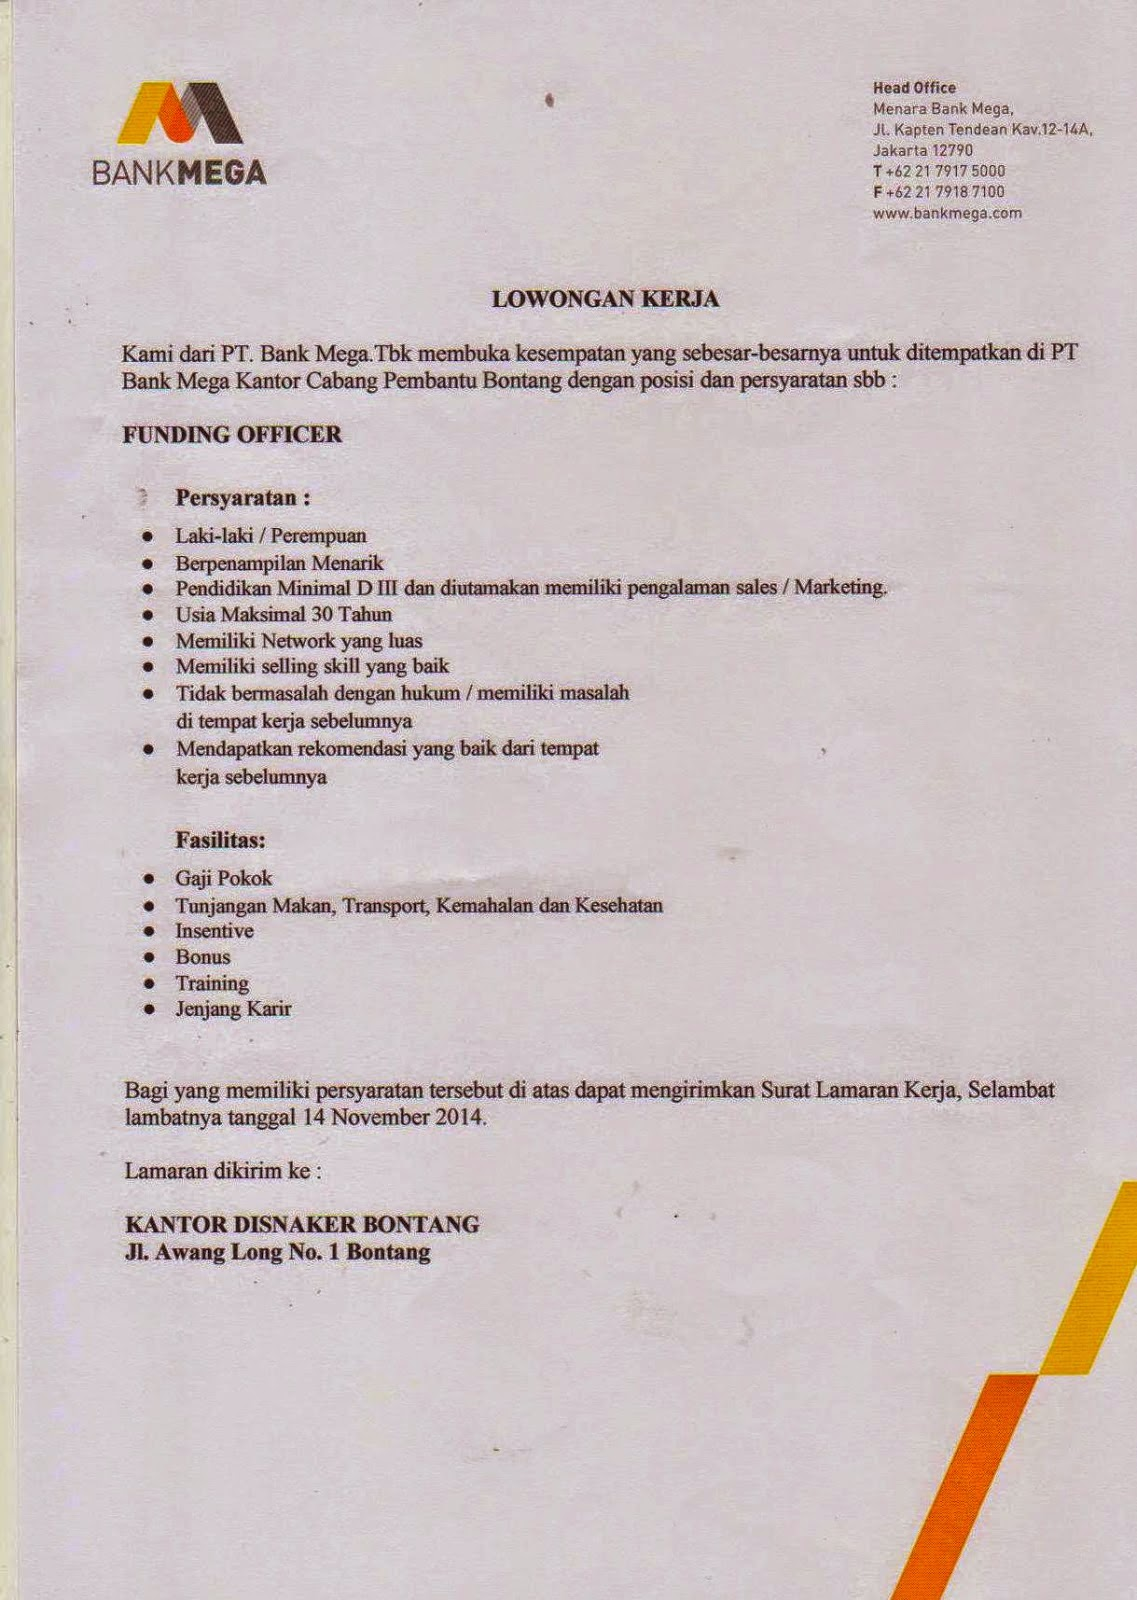 Lowongan Kerja Bank Mega November : D3 Funding Officer